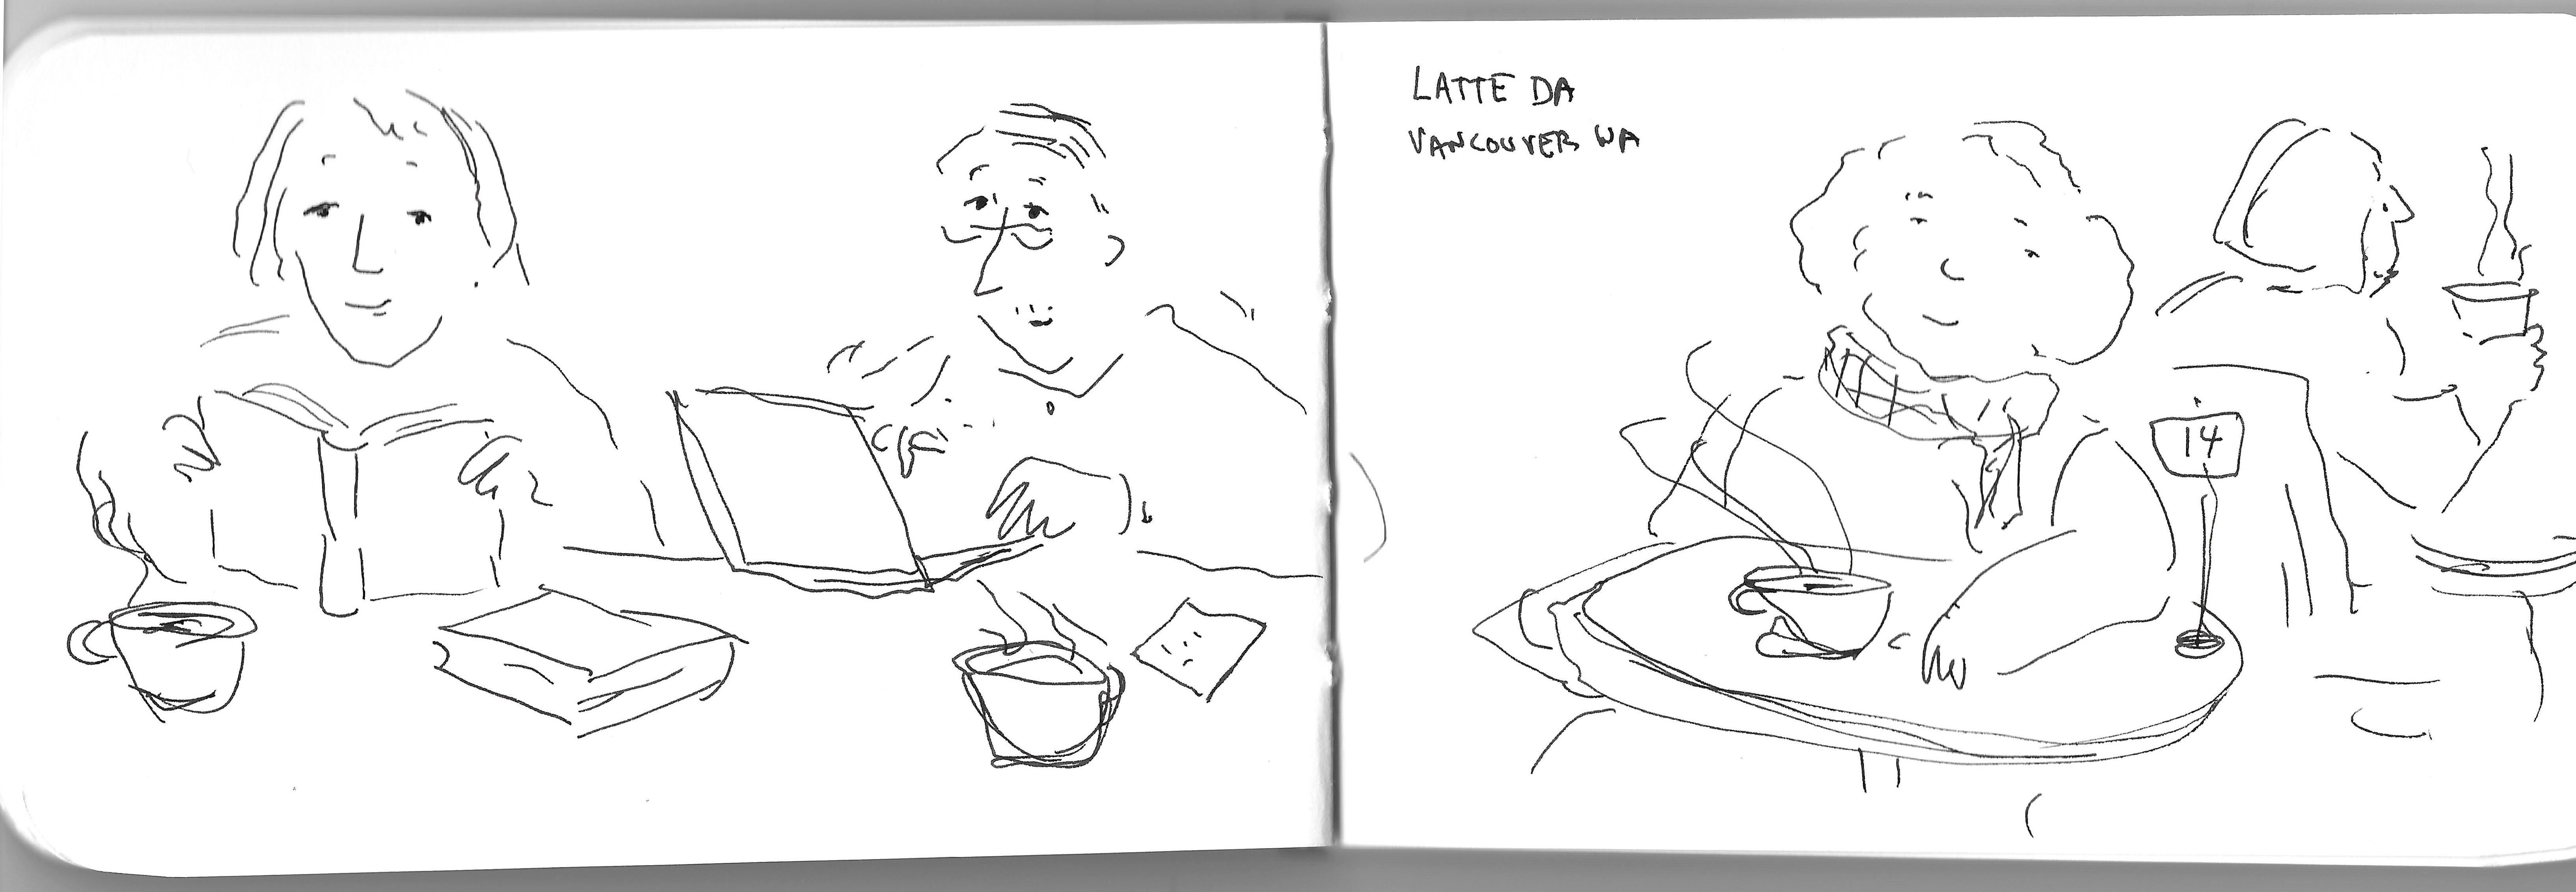 LatteDa